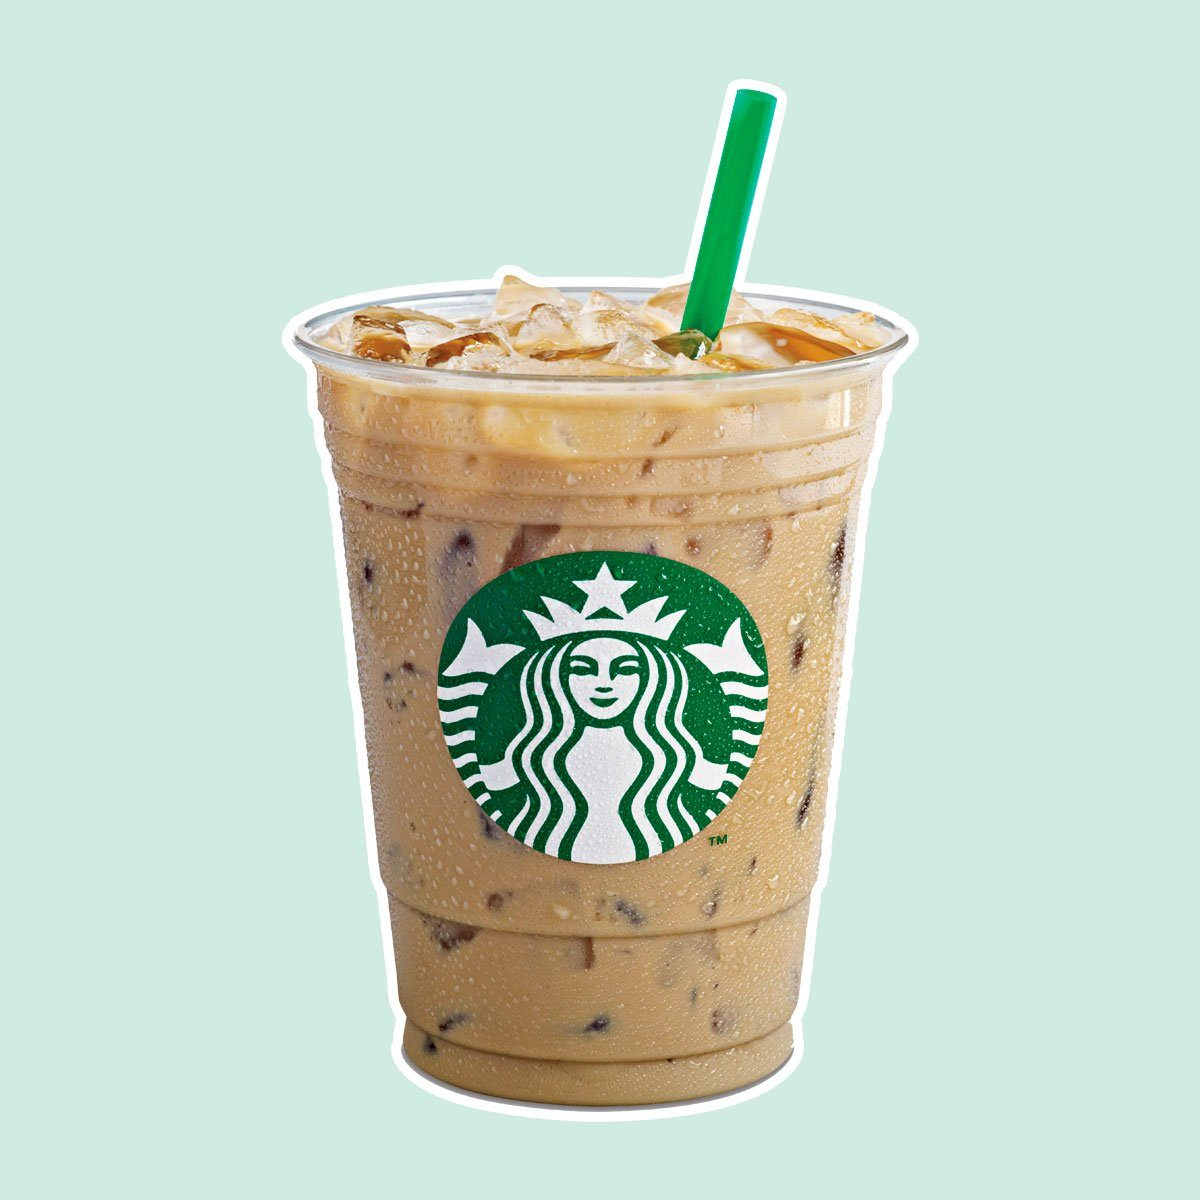 Healthy Starbucks Drinks That Taste Indulgent